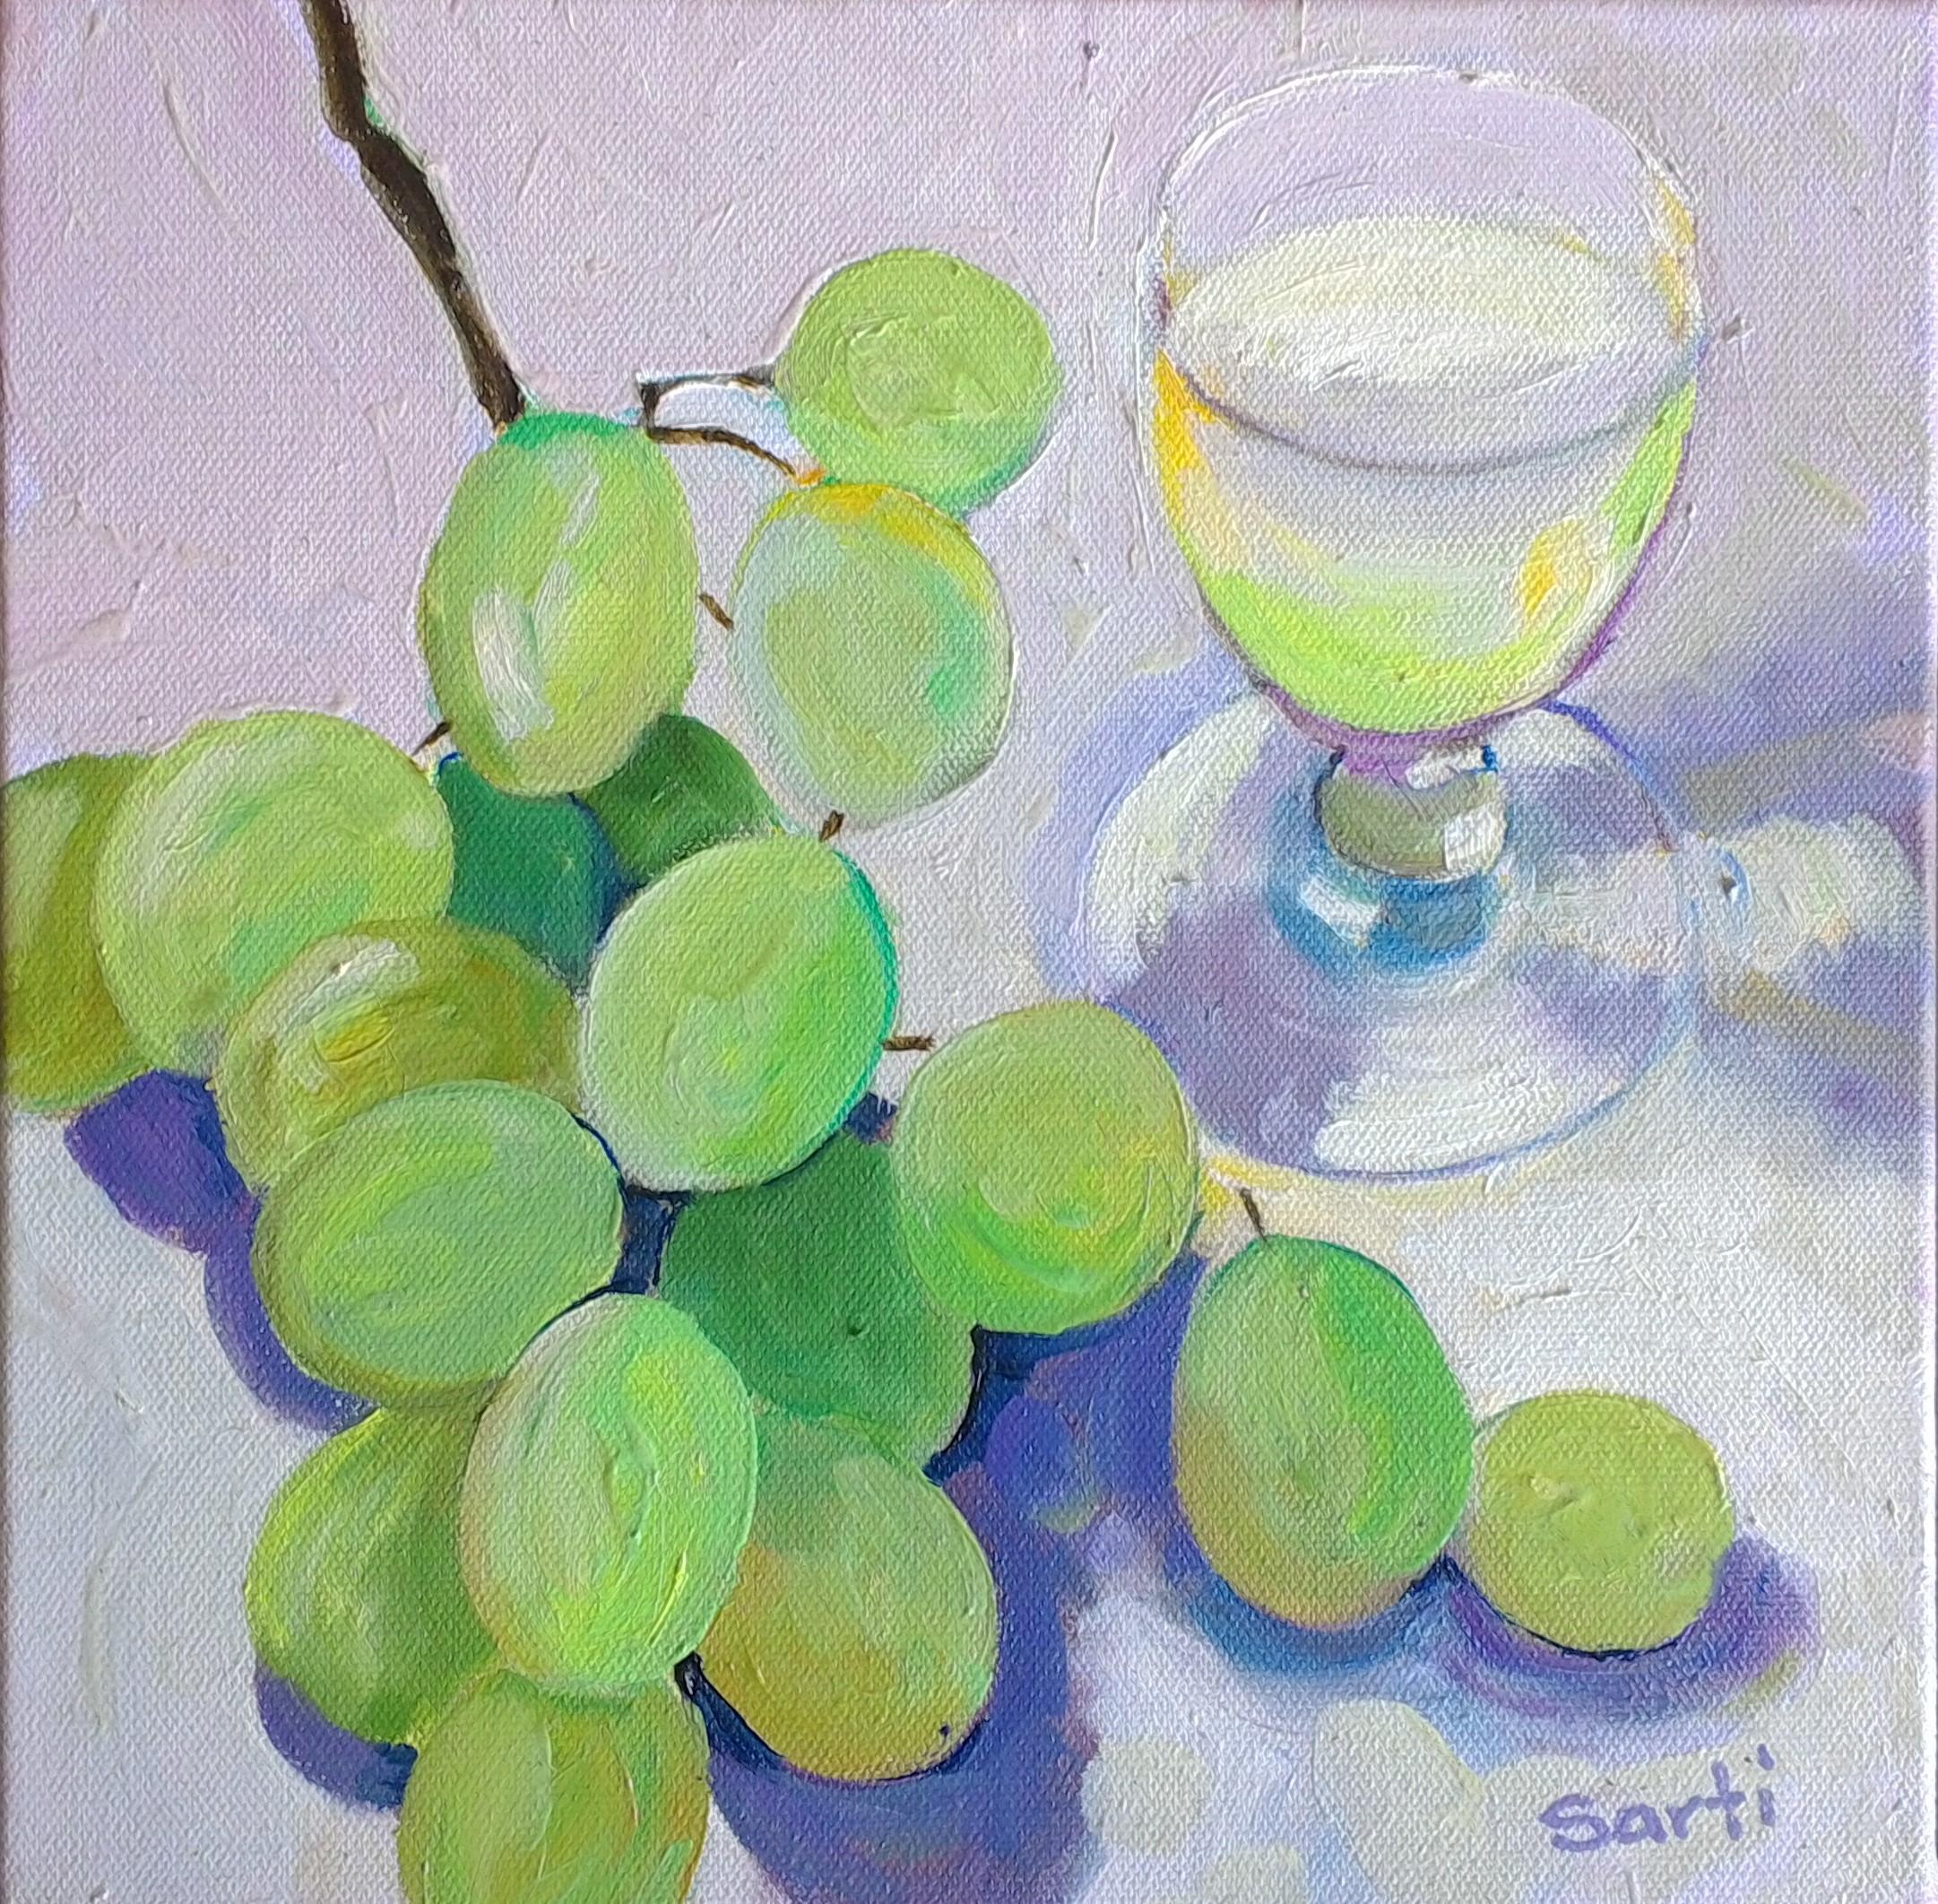 White wine oil on canvas 25x25cm $300.jp